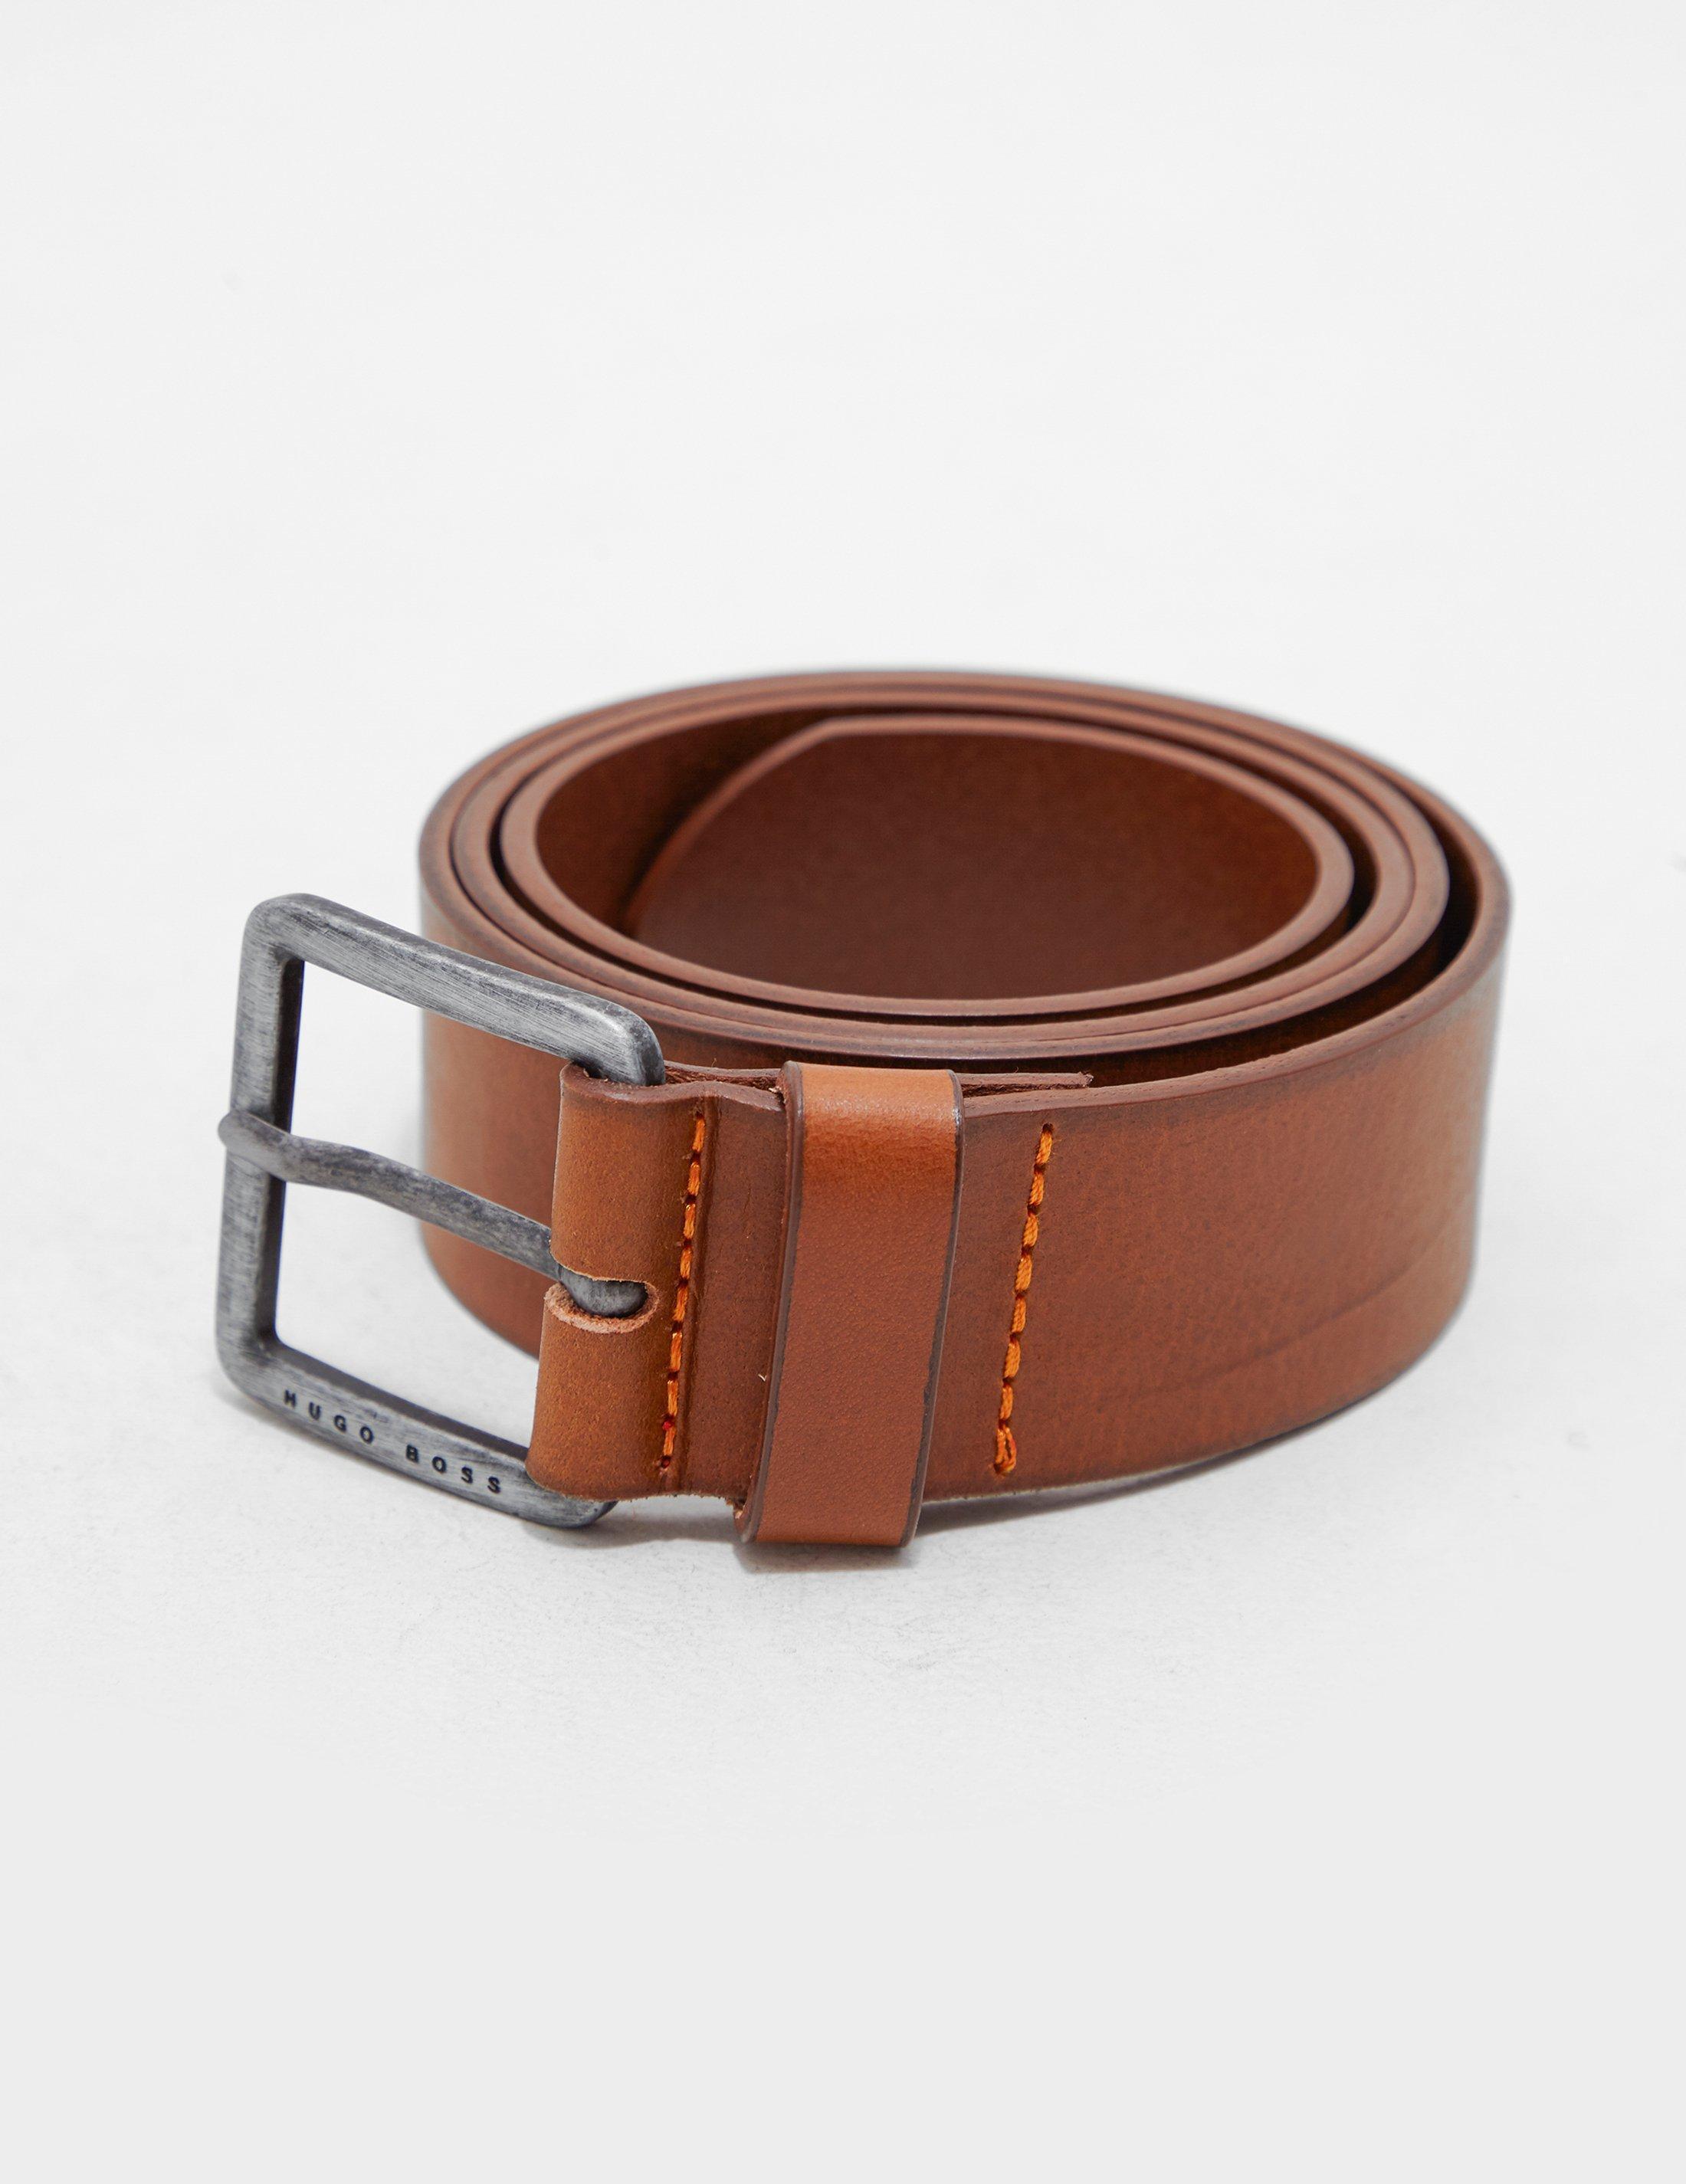 3beadd64cc9f Lyst - BOSS Jeeko Leather Belt Tan/tan in Brown for Men